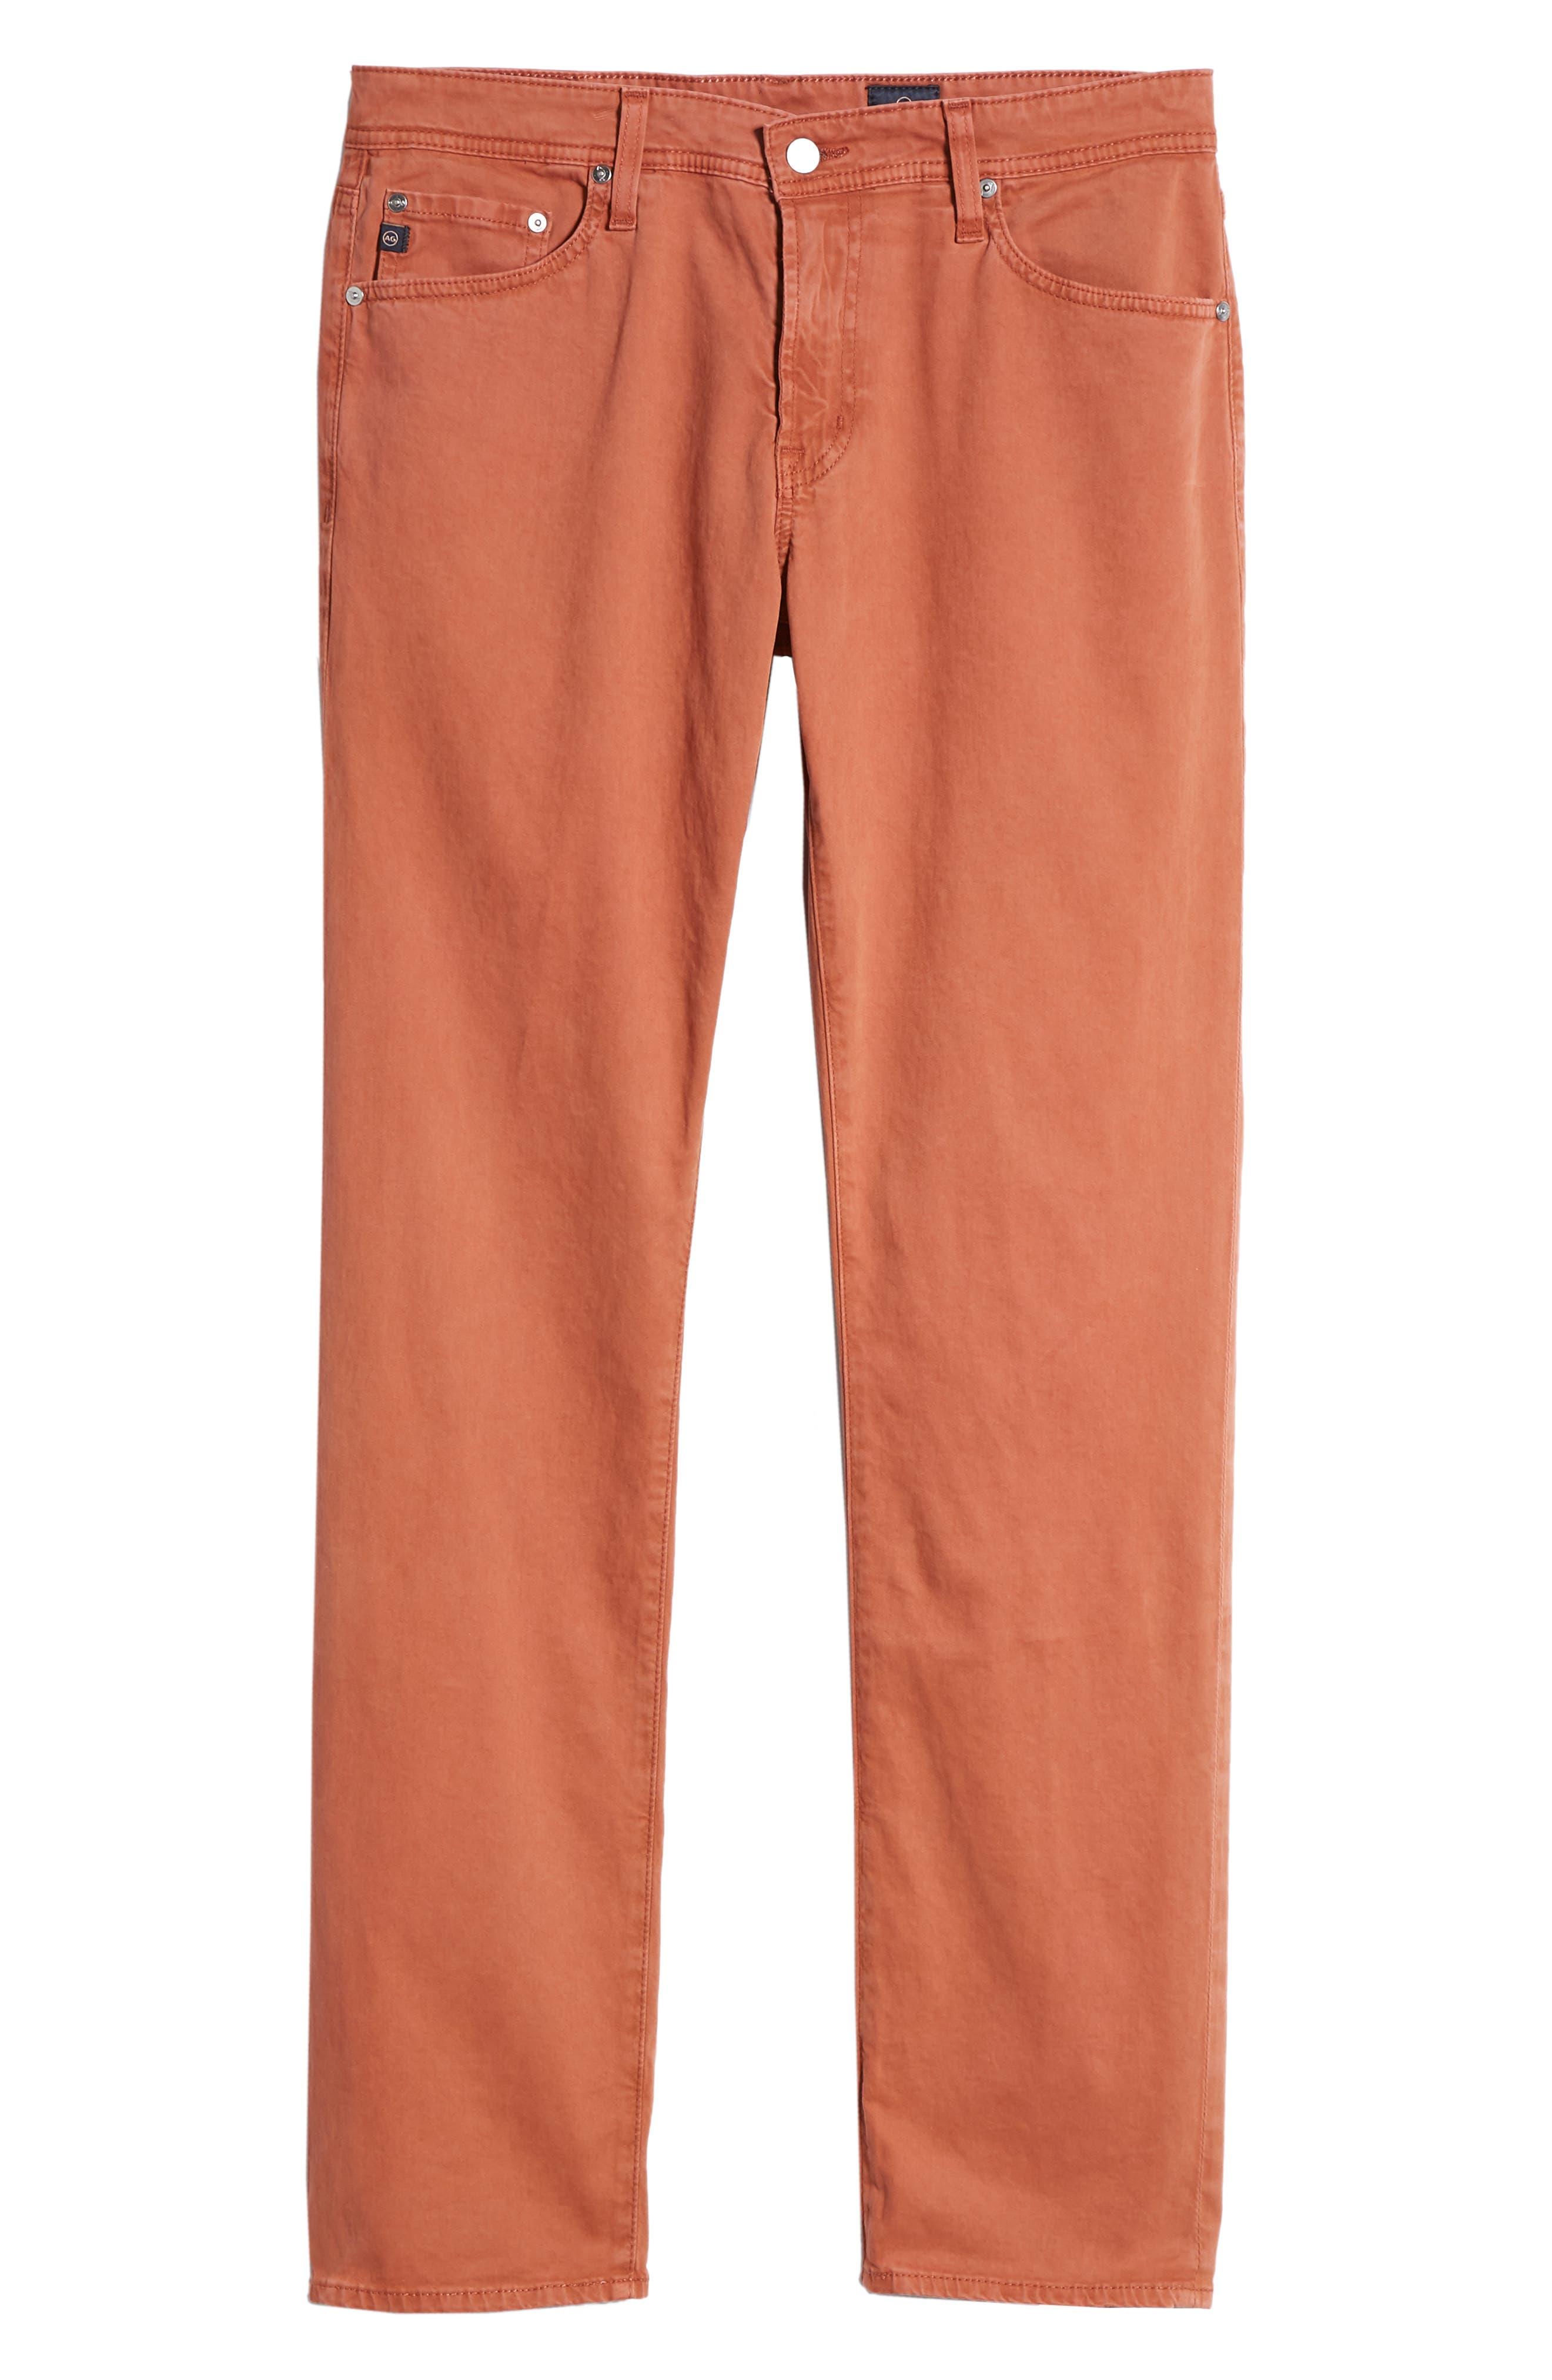 Graduate SUD Slim Straight Leg Pants,                             Alternate thumbnail 6, color,                             Sulfur Rosso Red